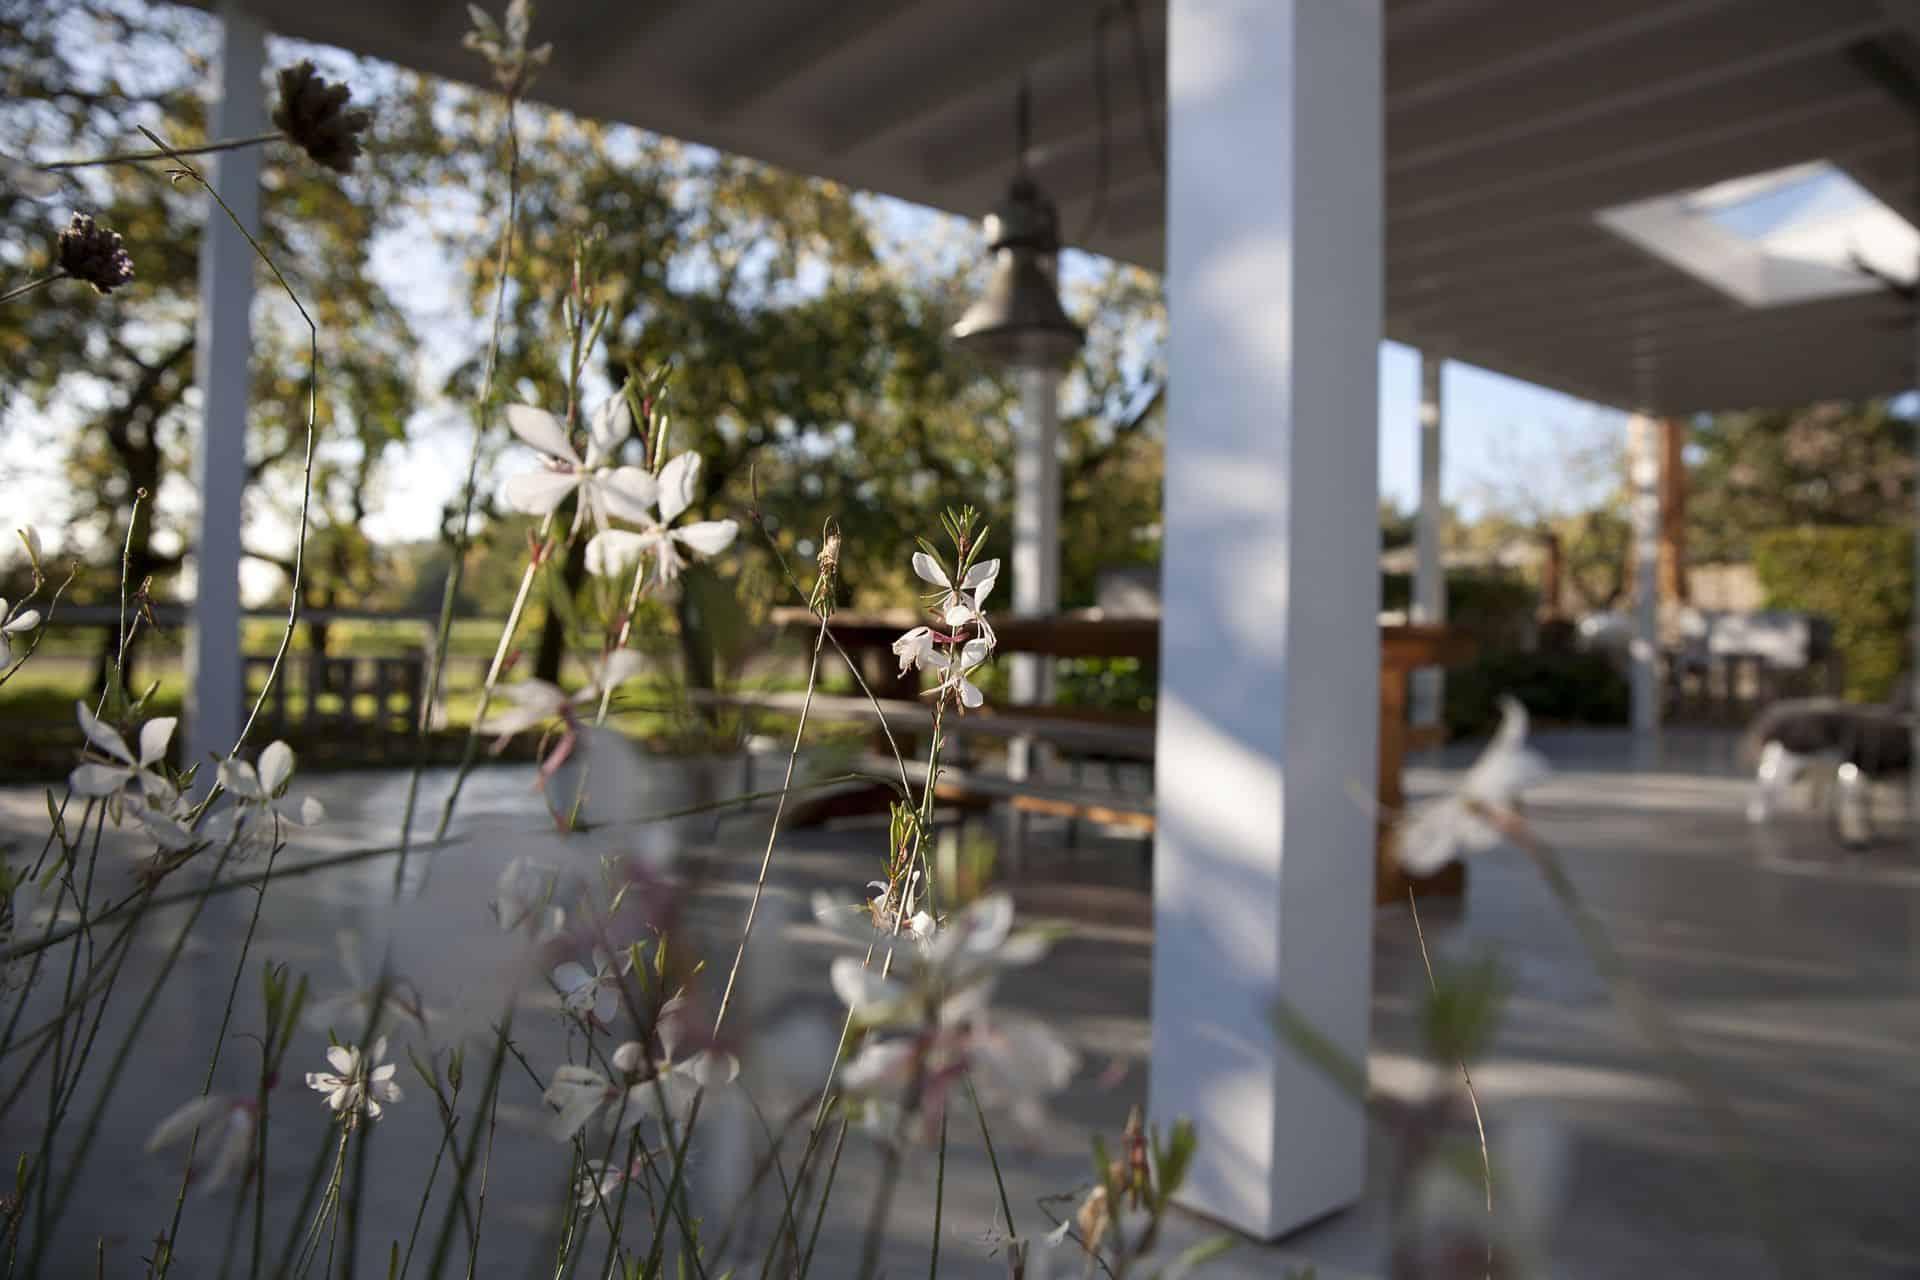 betonnen terras in tuin, beton terras in de achtertuin